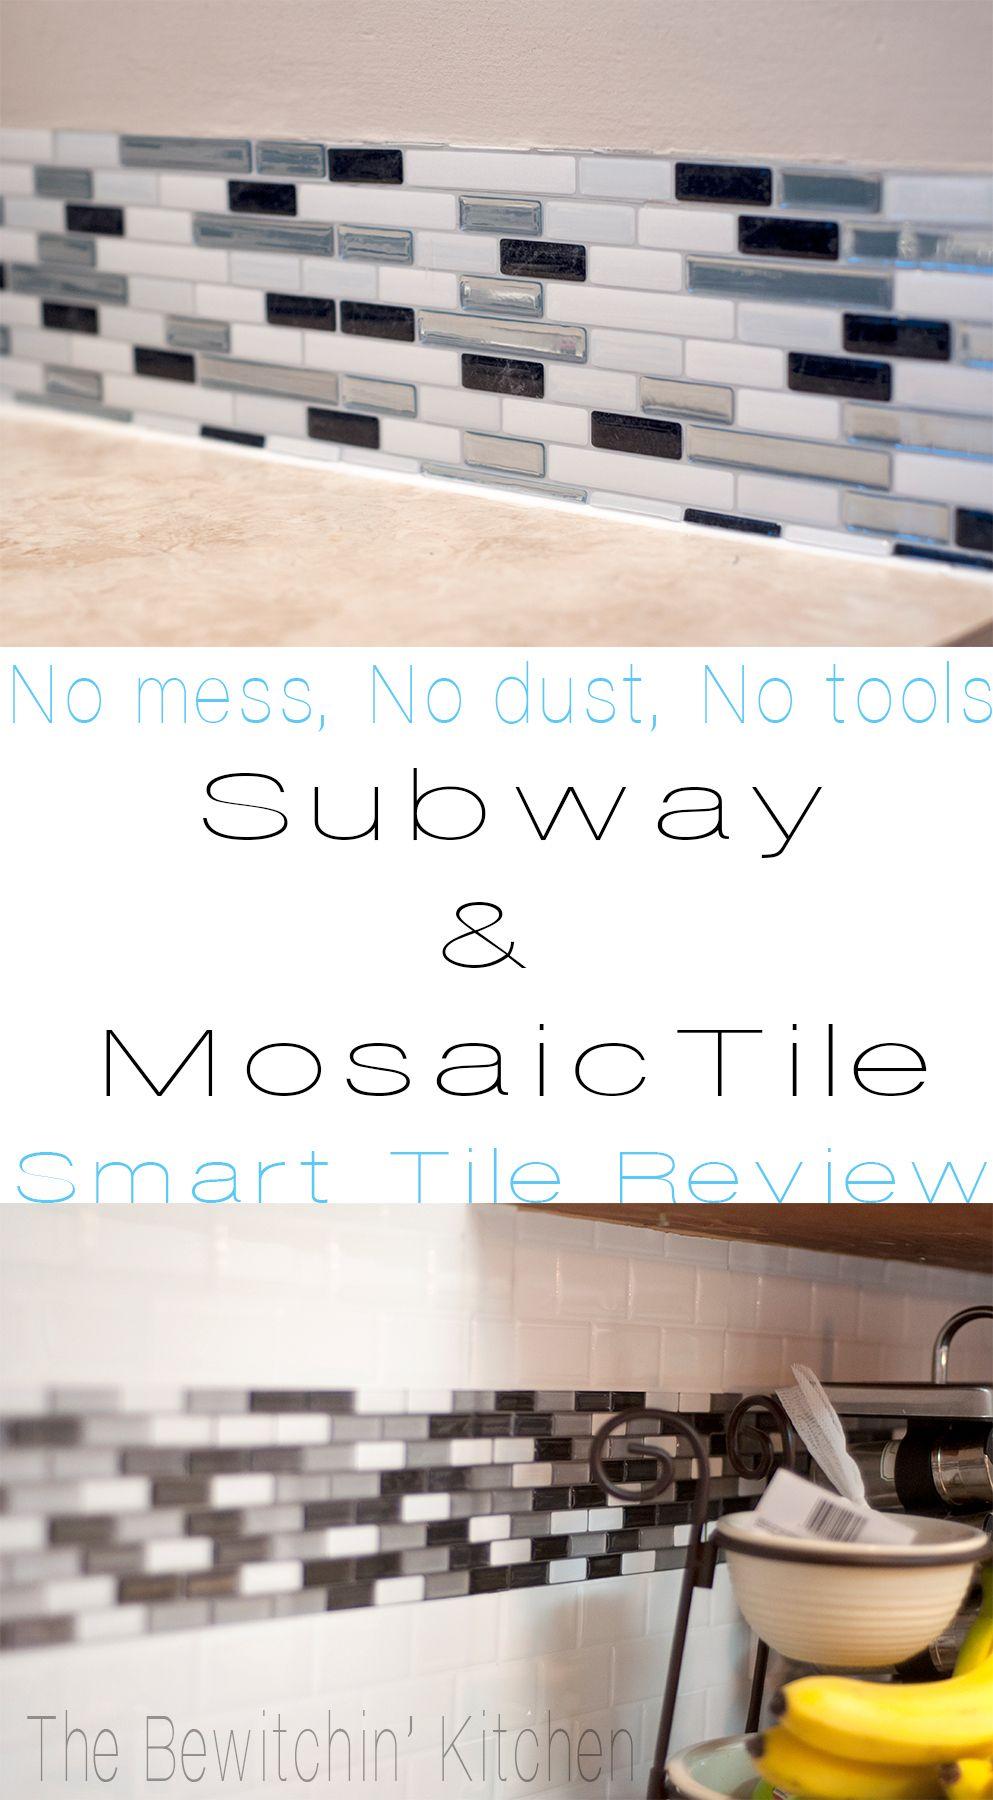 Smart Tiles Review Update Your Backsplash The Easy Way The Bewitchin Kitchen Smart Tiles Smart Tiles Backsplash Home